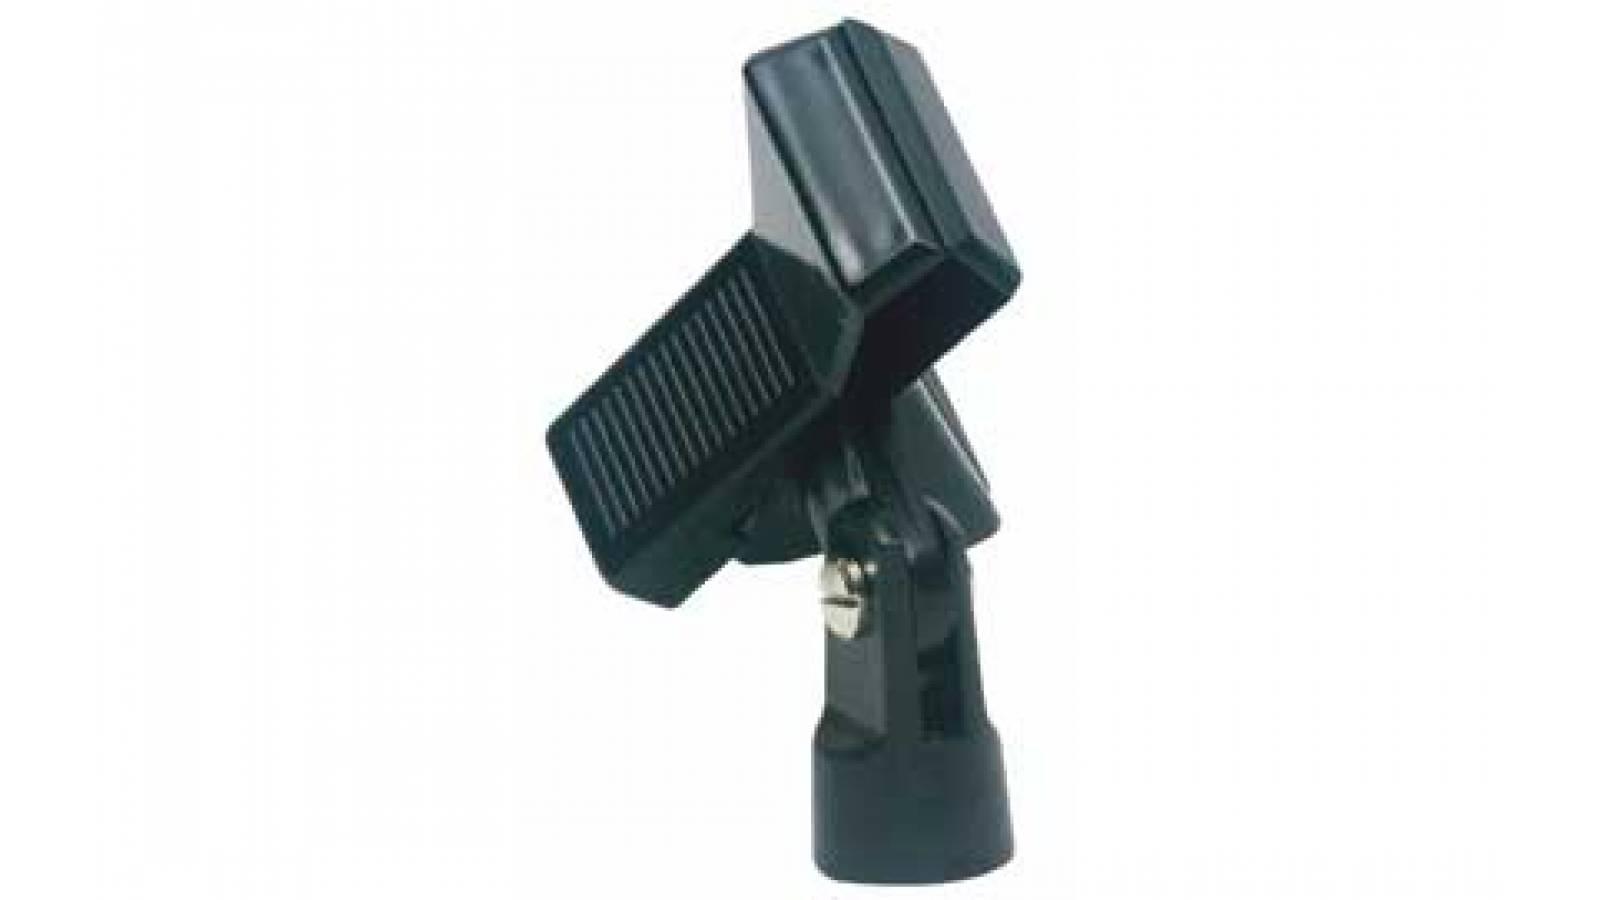 Porta Micrófono / Pipeta / Clamp Pinza